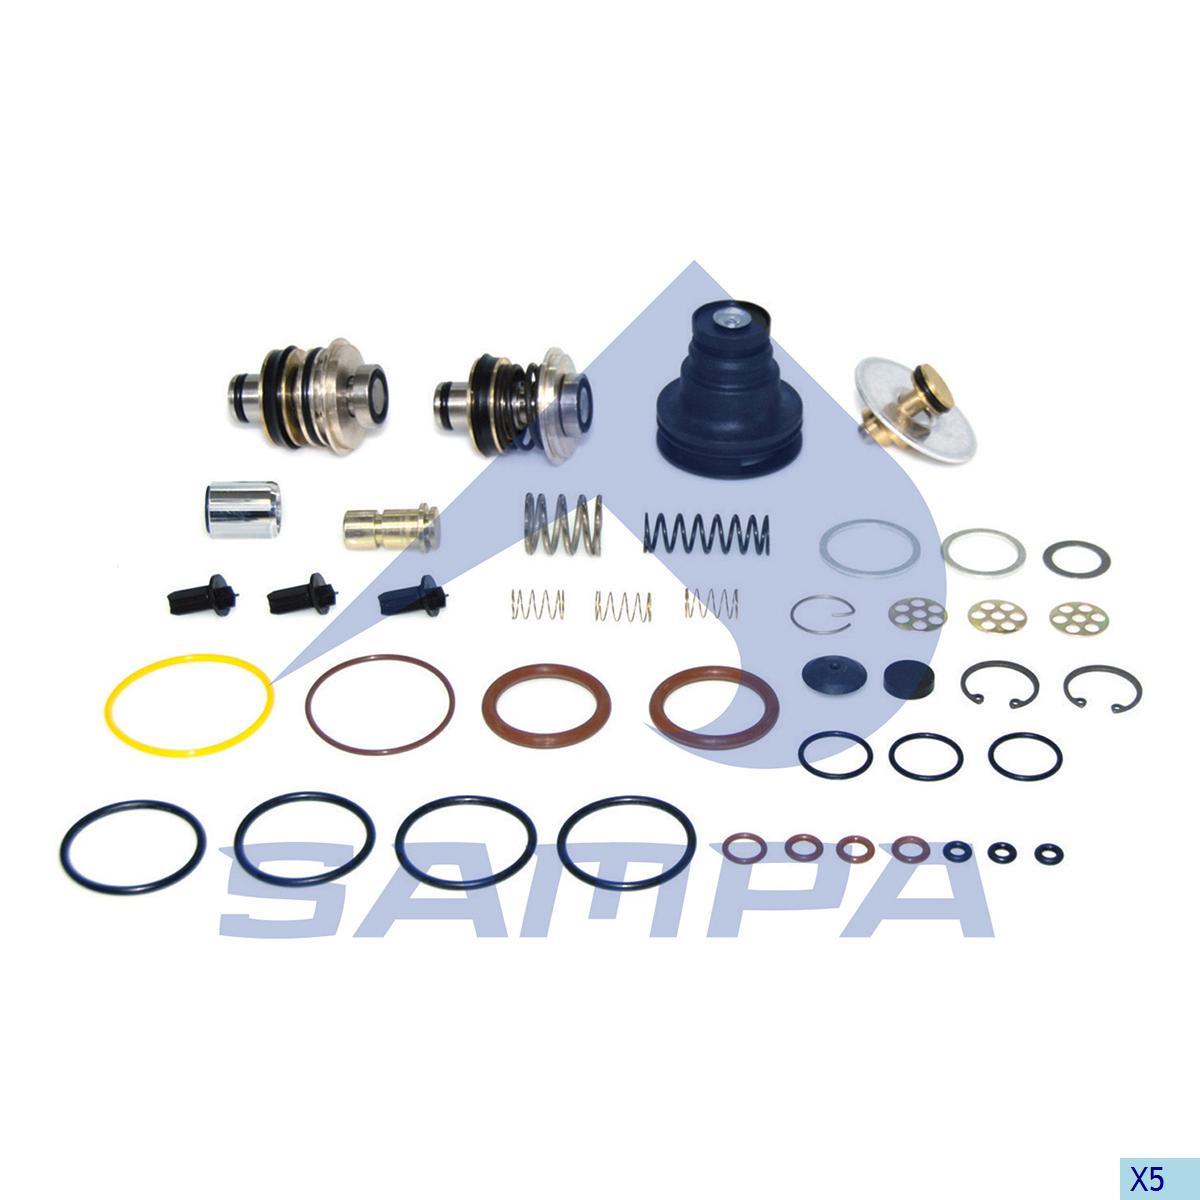 Repair Kit, Valve, Volvo, Compressed Air System